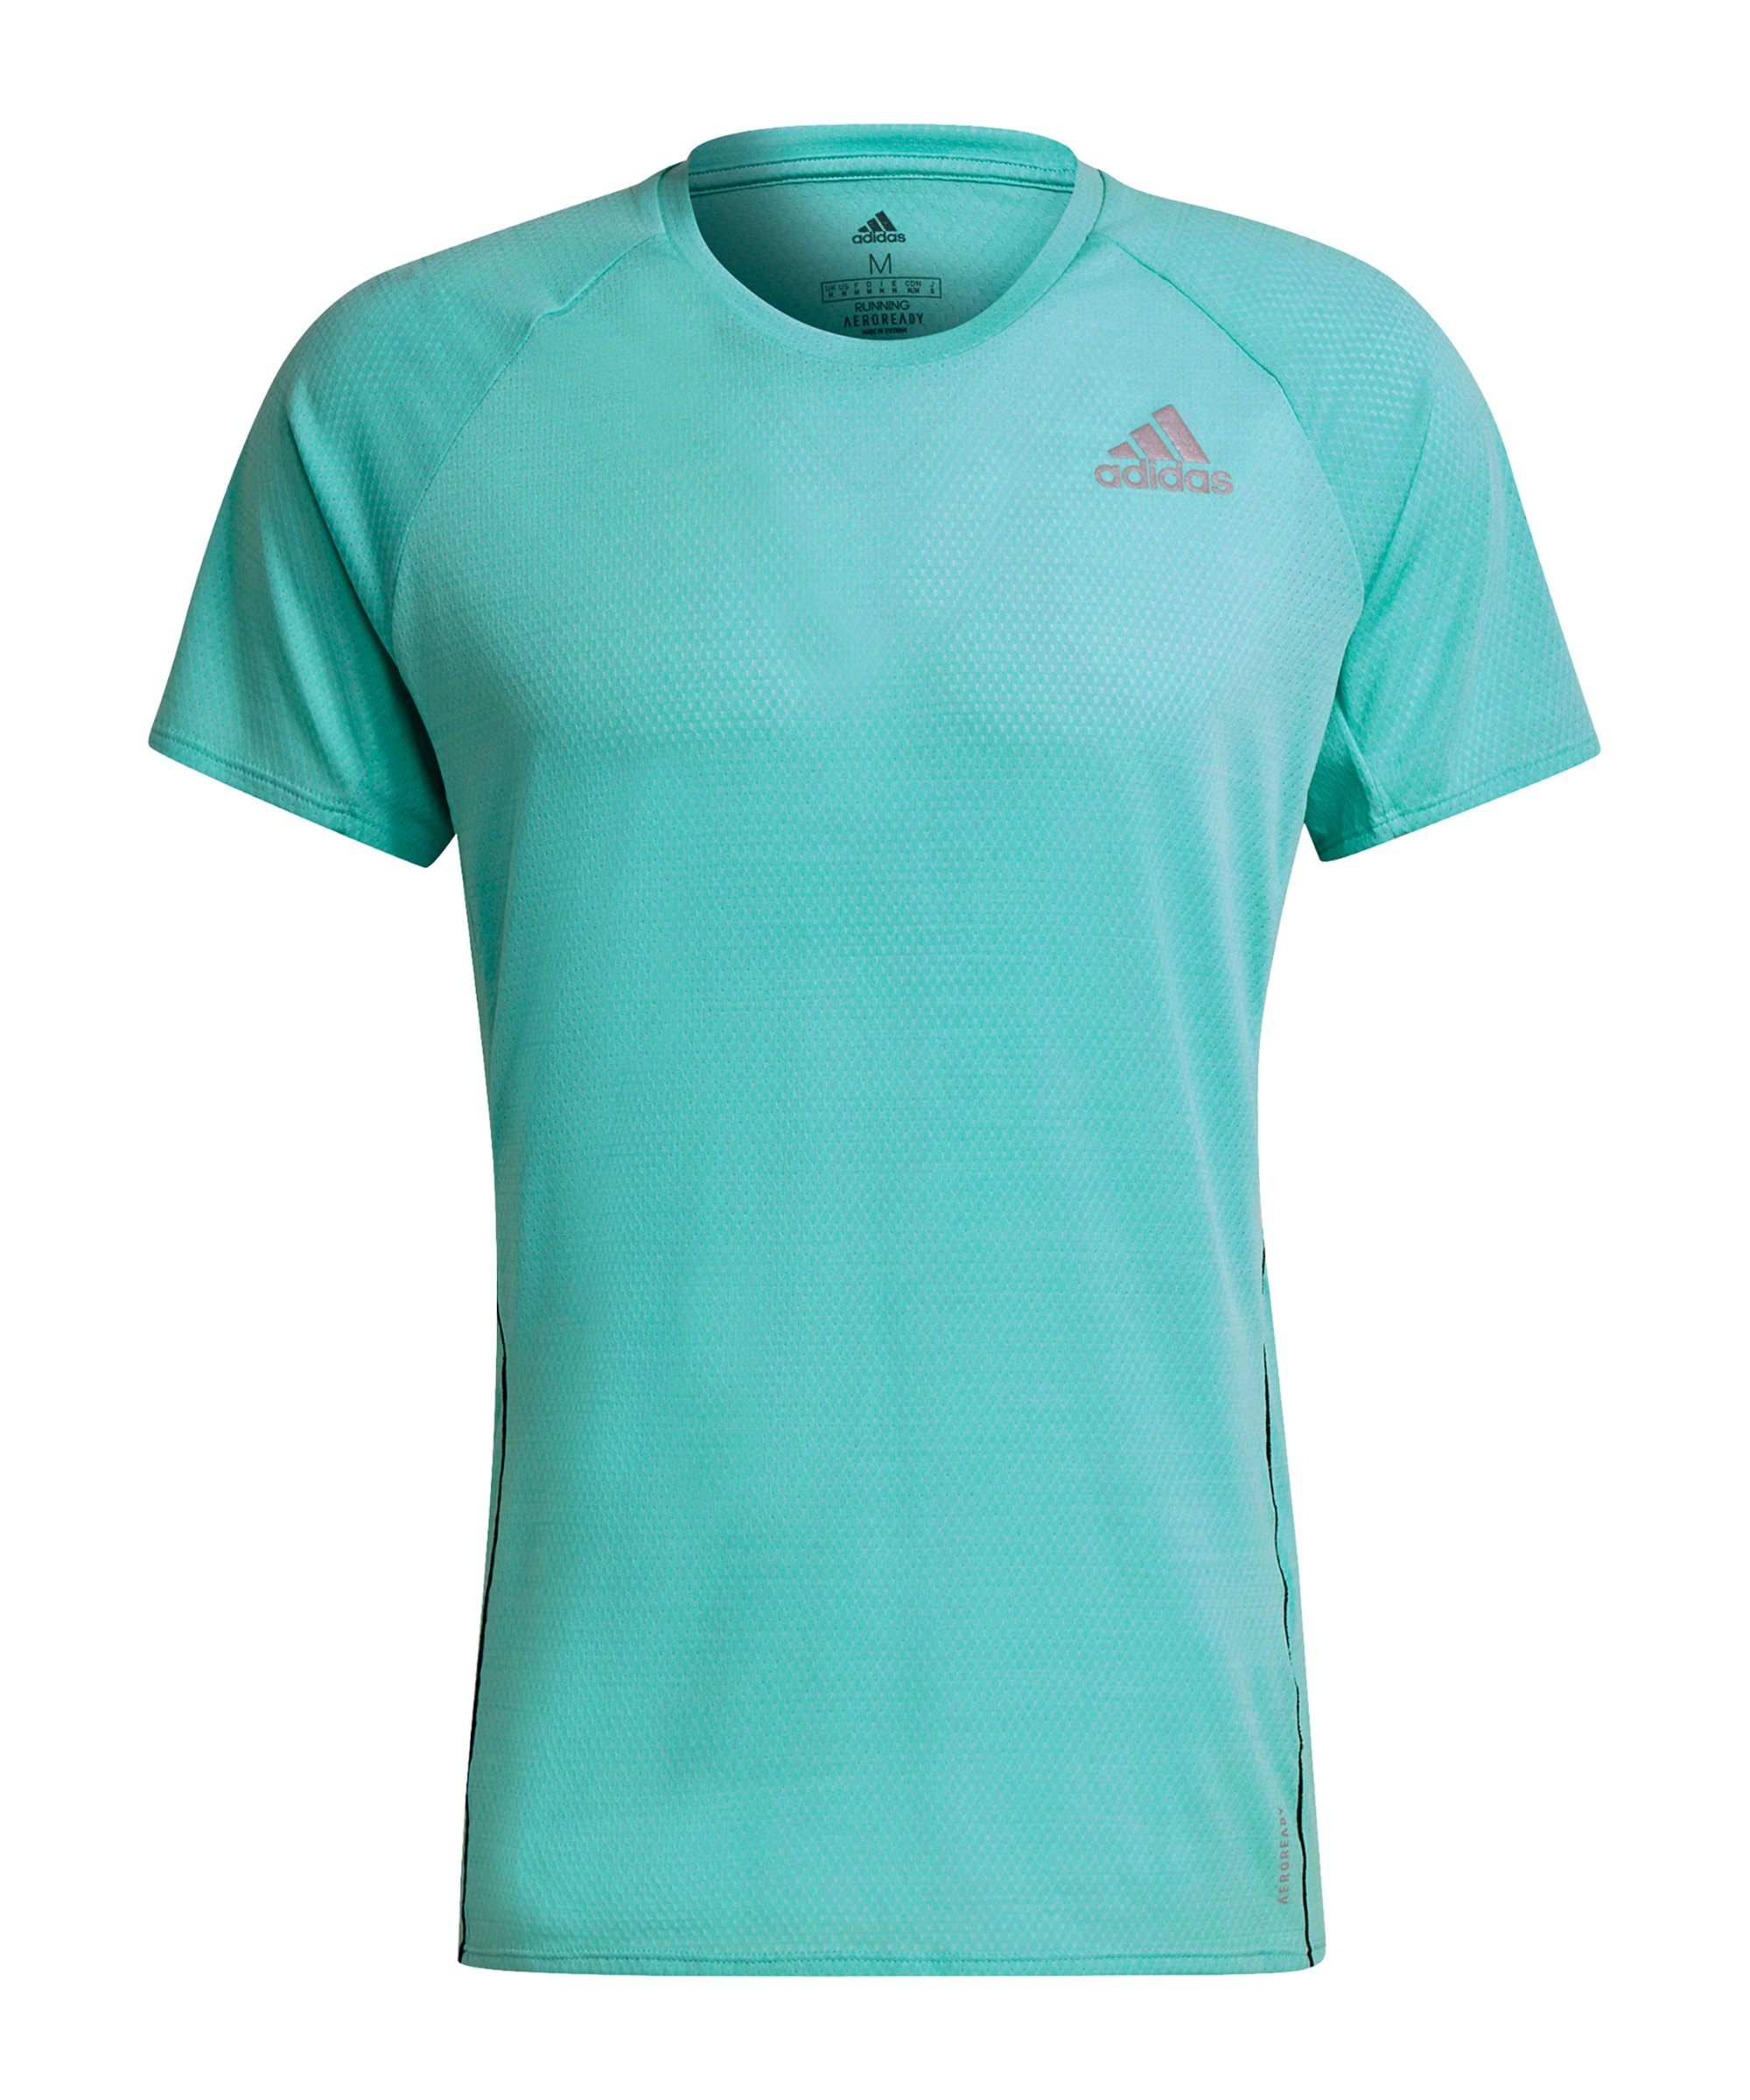 adidas Runner T-Shirt Running Türkis - tuerkis